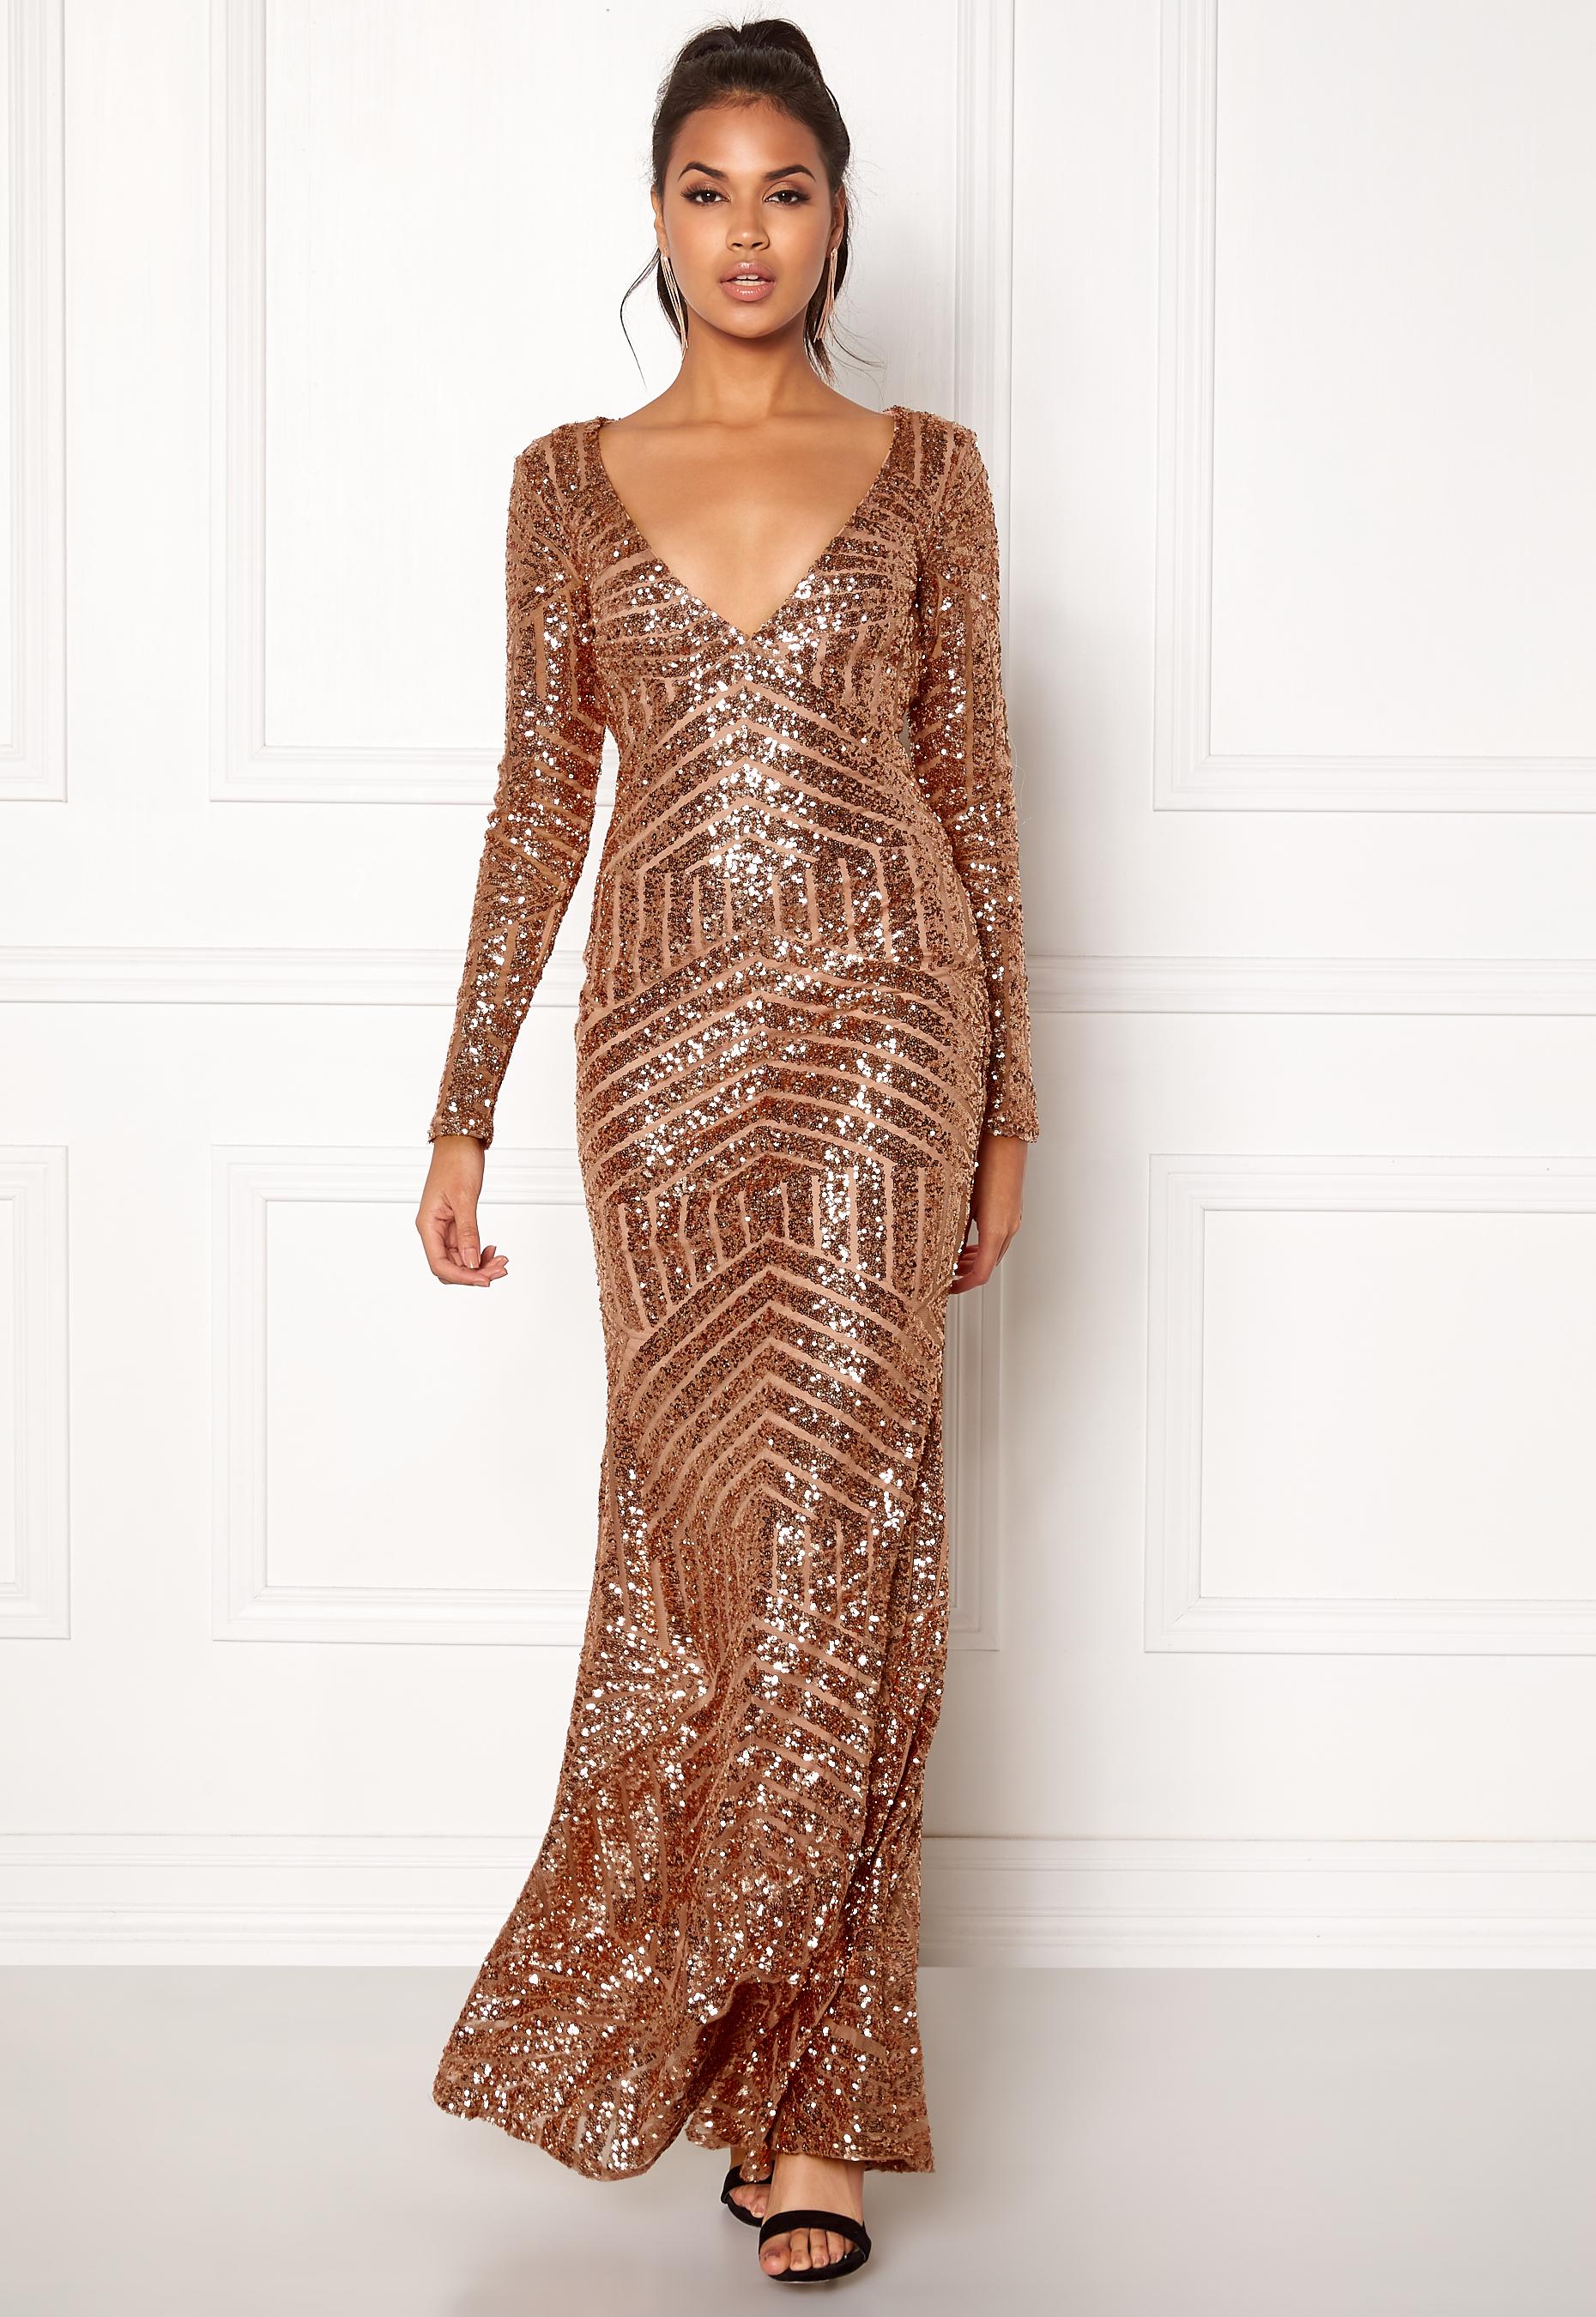 83eb3c944ef Goddiva Open Back Sequin Dress Champagne - Bubbleroom